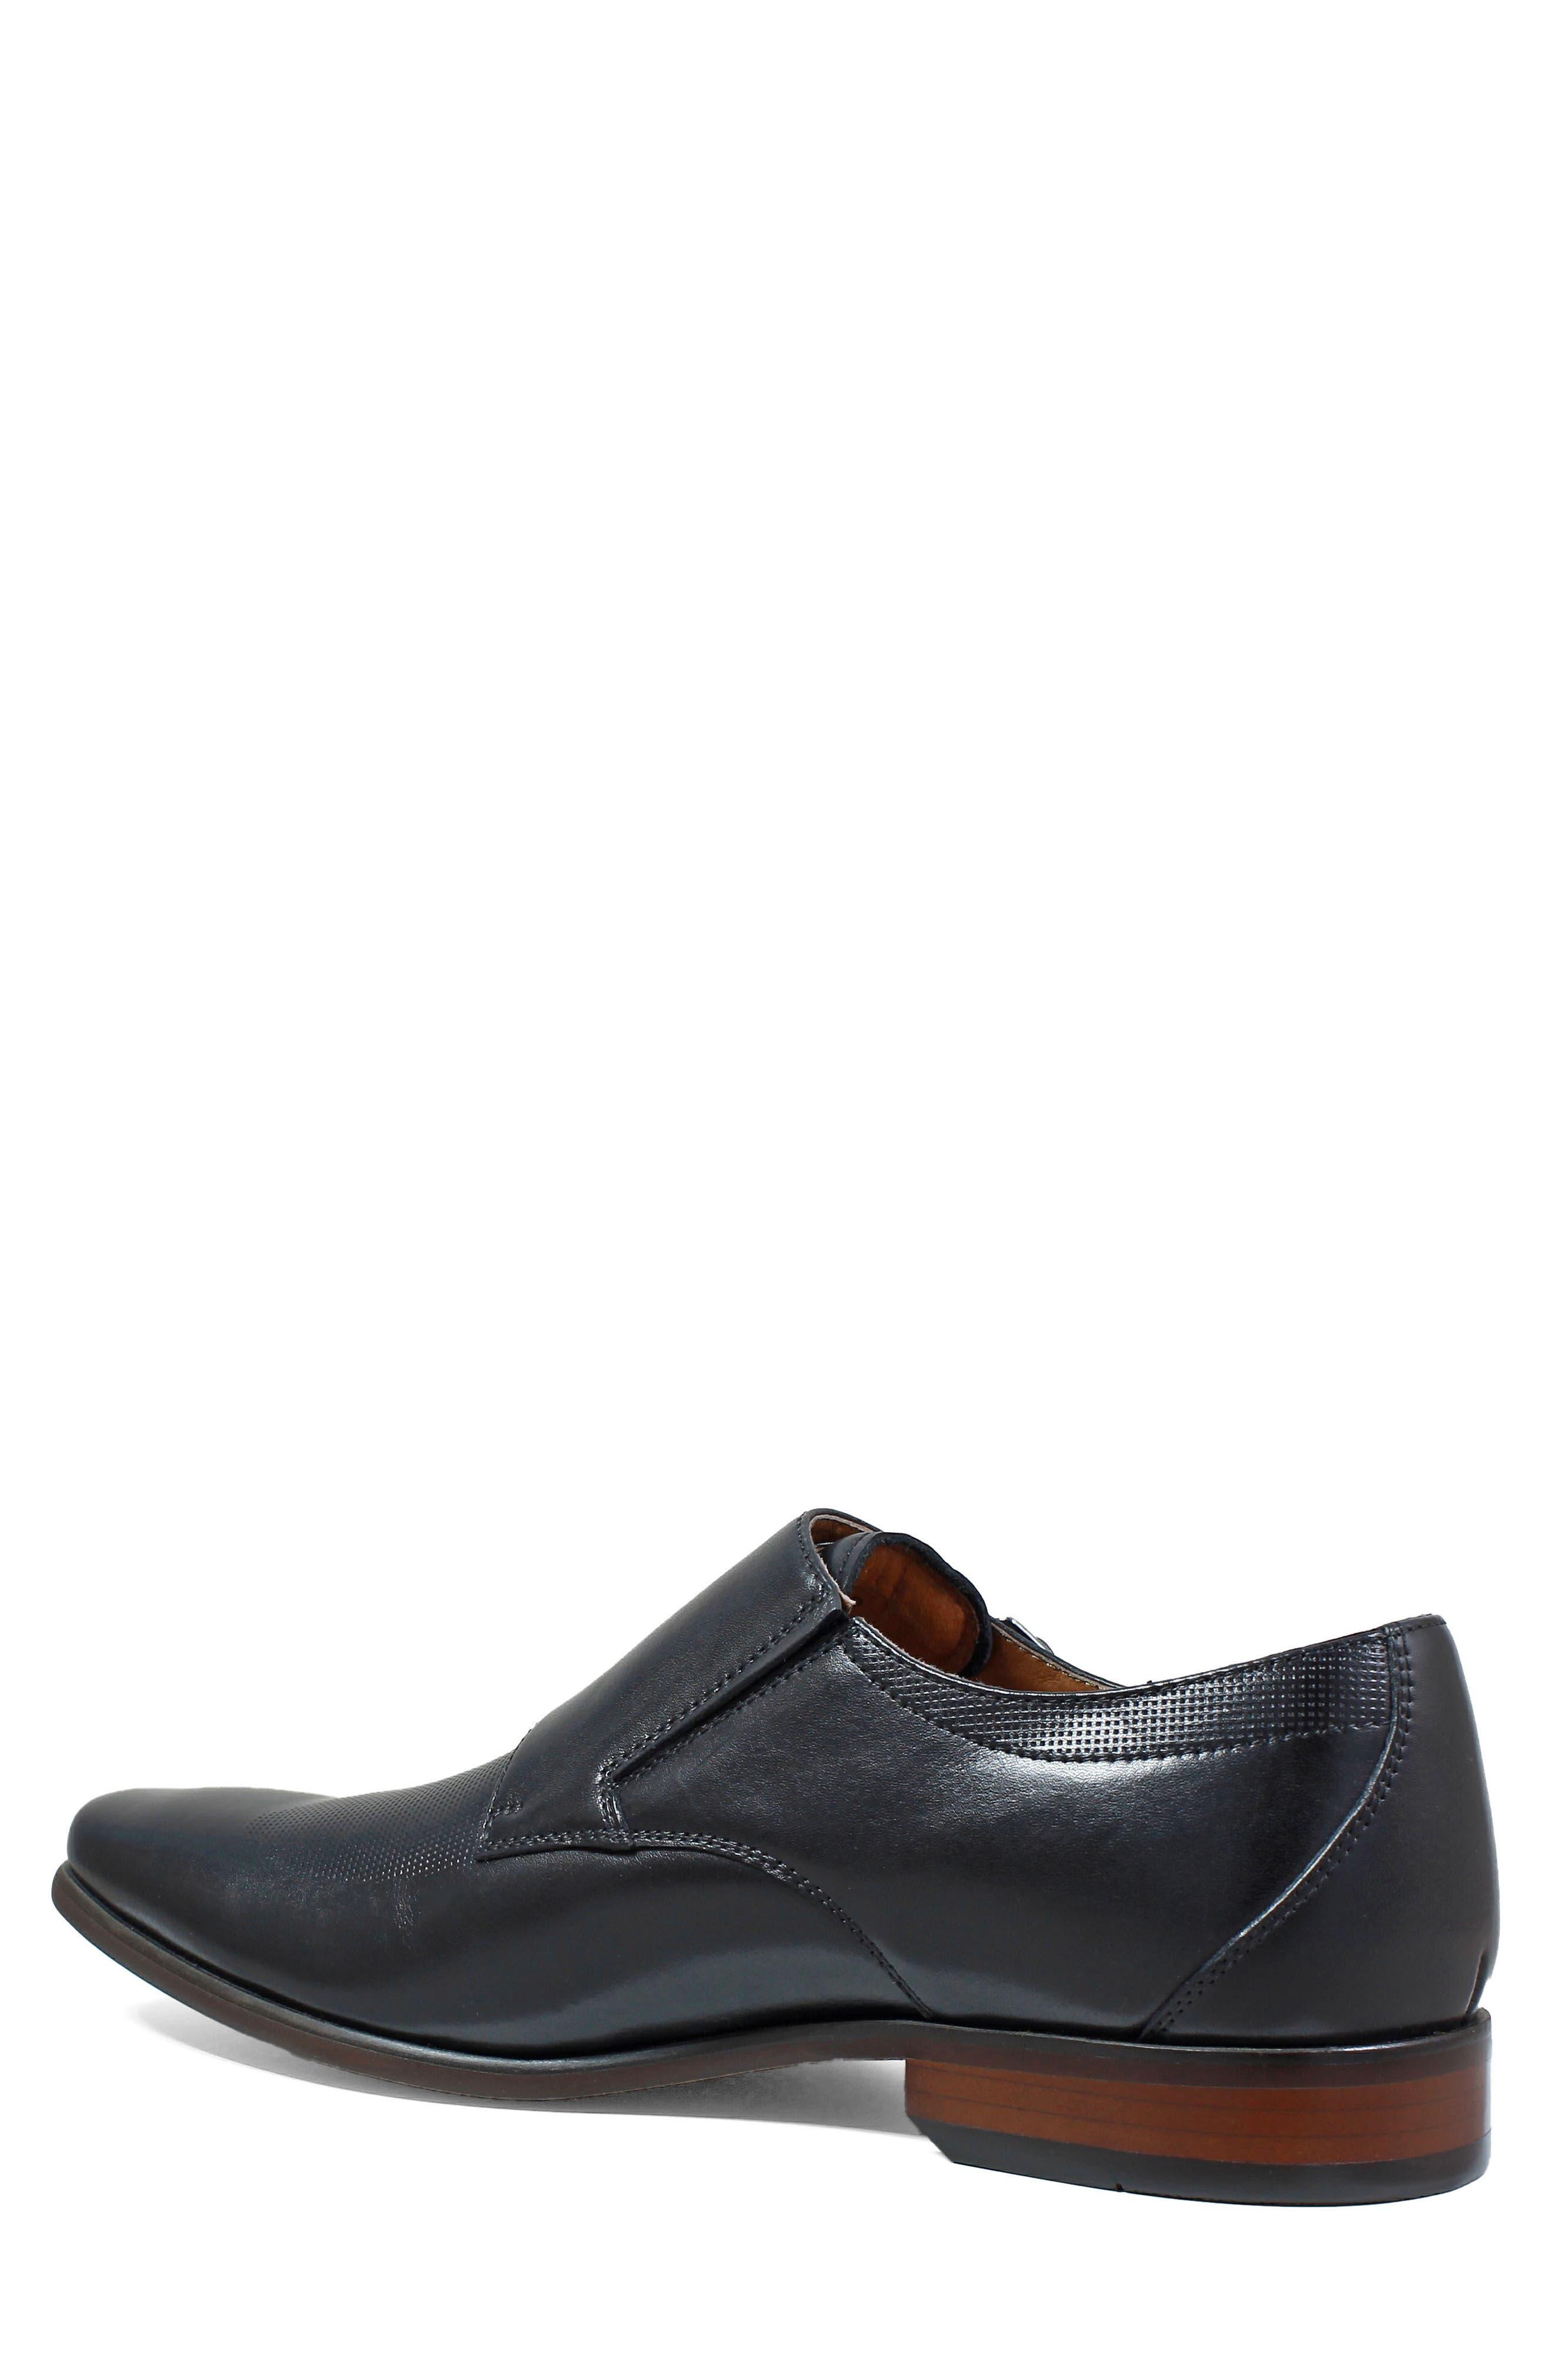 FLORSHEIM, Postino Textured Double Strap Monk Shoe, Alternate thumbnail 2, color, BLACK LEATHER